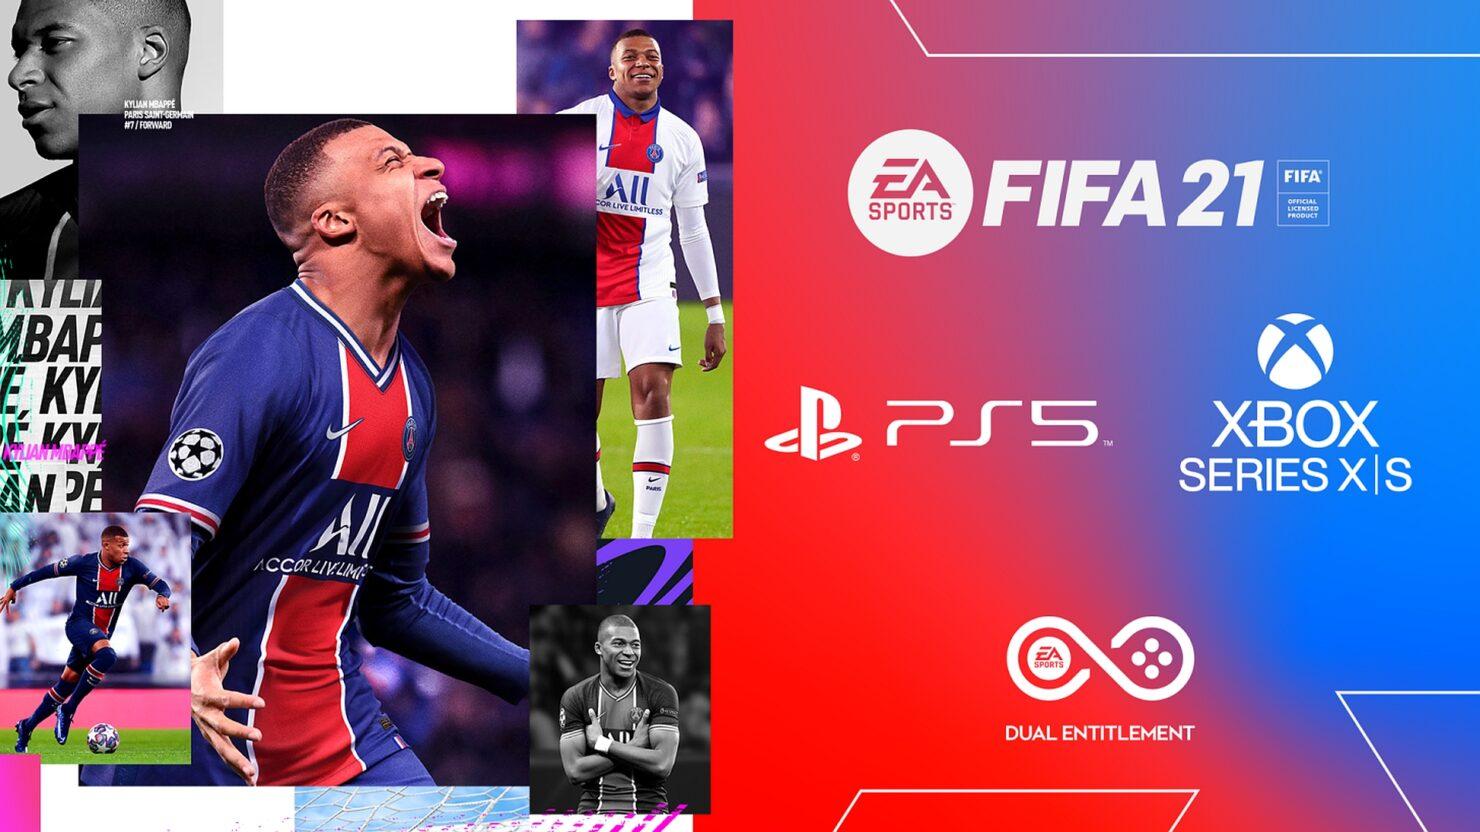 FIFA 21 Next-Gen